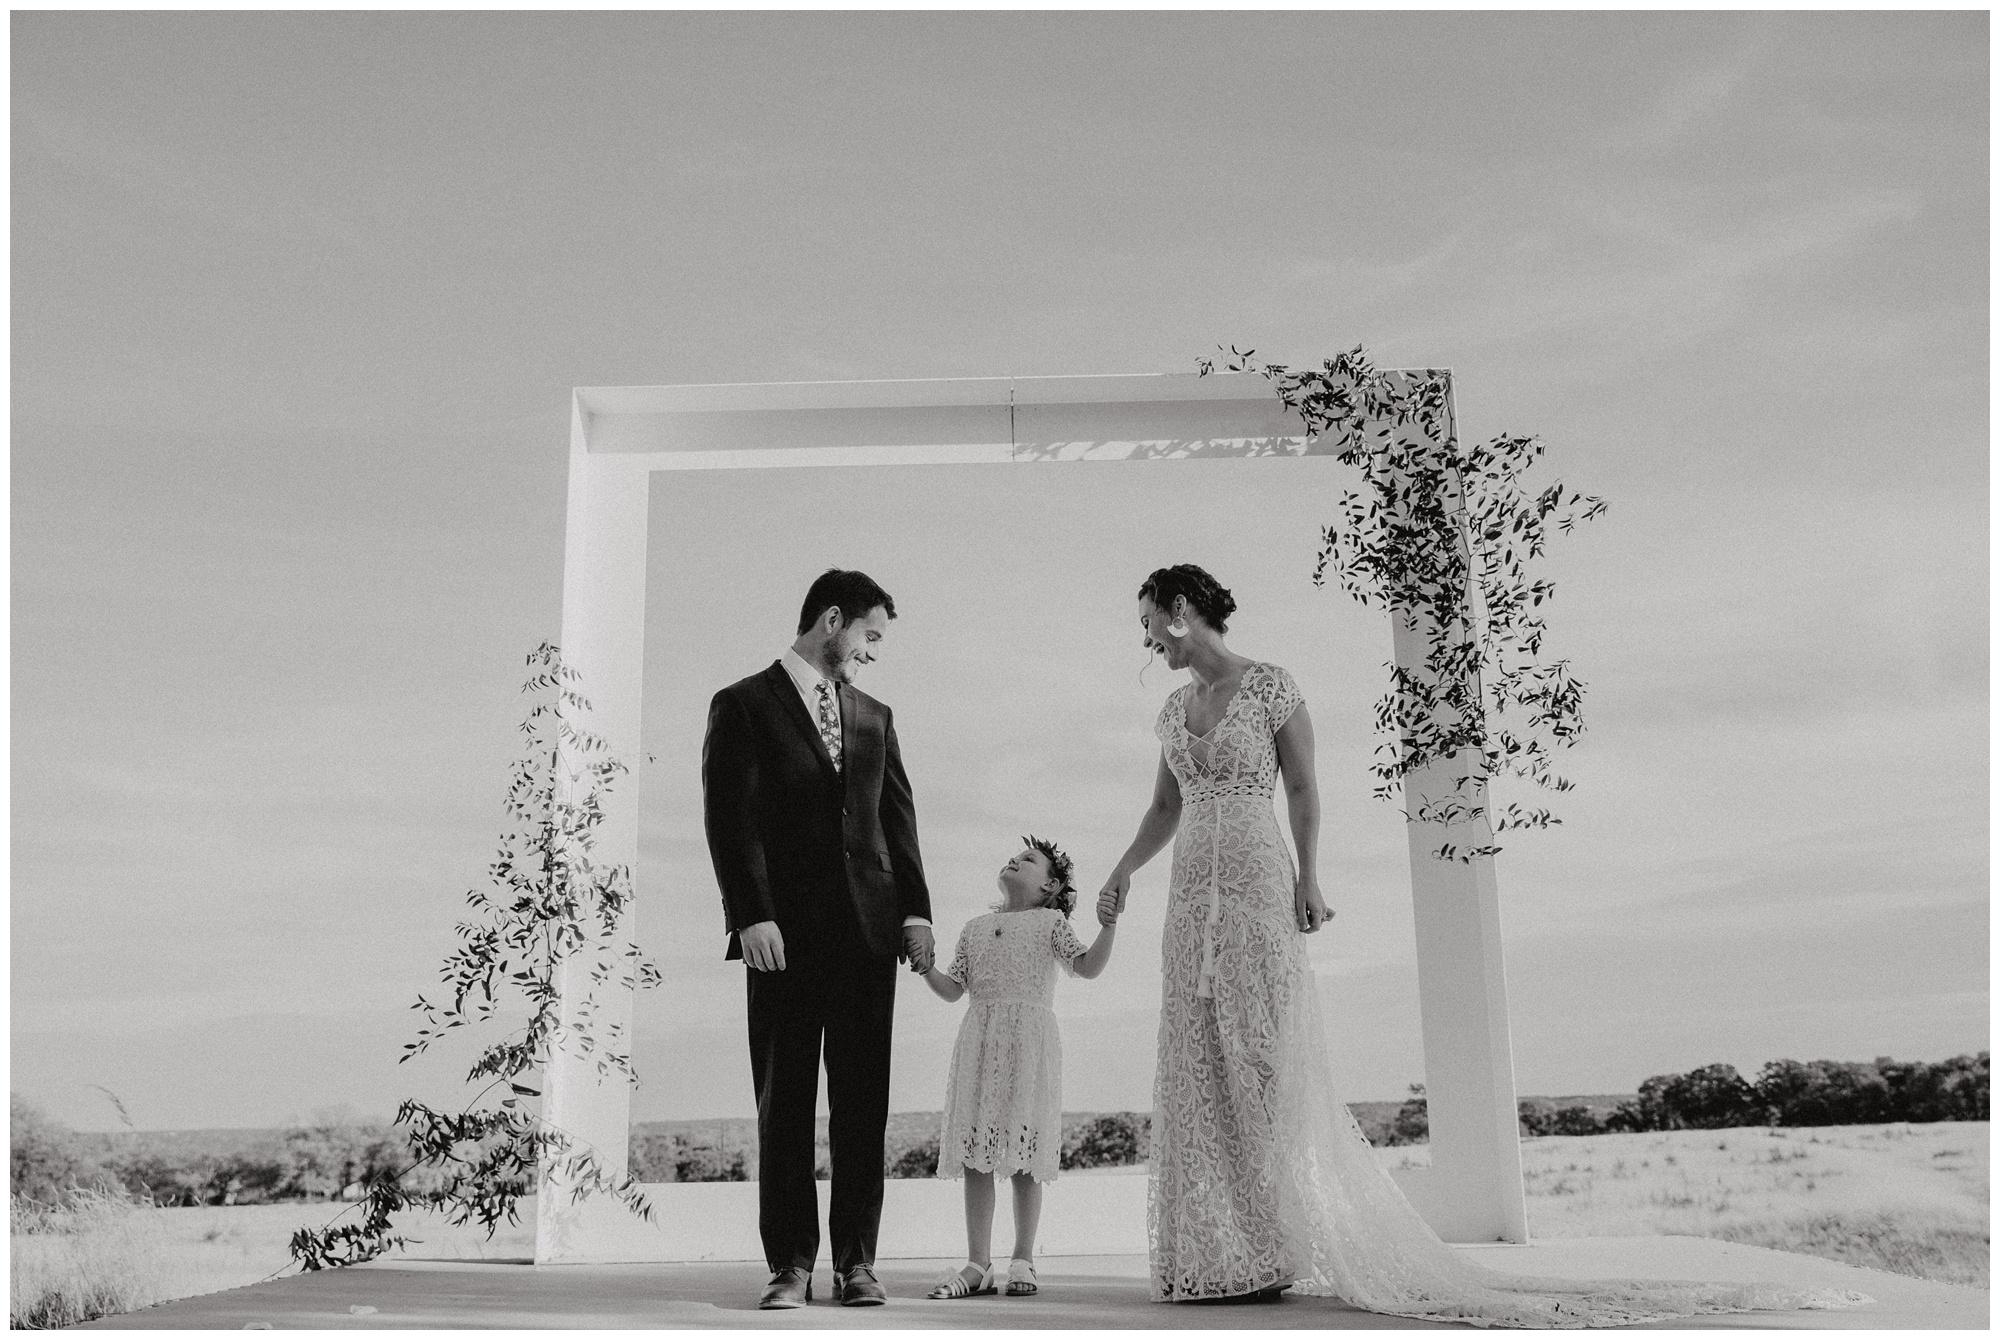 AUSTIN-TEXAS-PROSPECT-HOUSE-WEDDING-VENUE-PHOTOGRAPHY25800.JPG